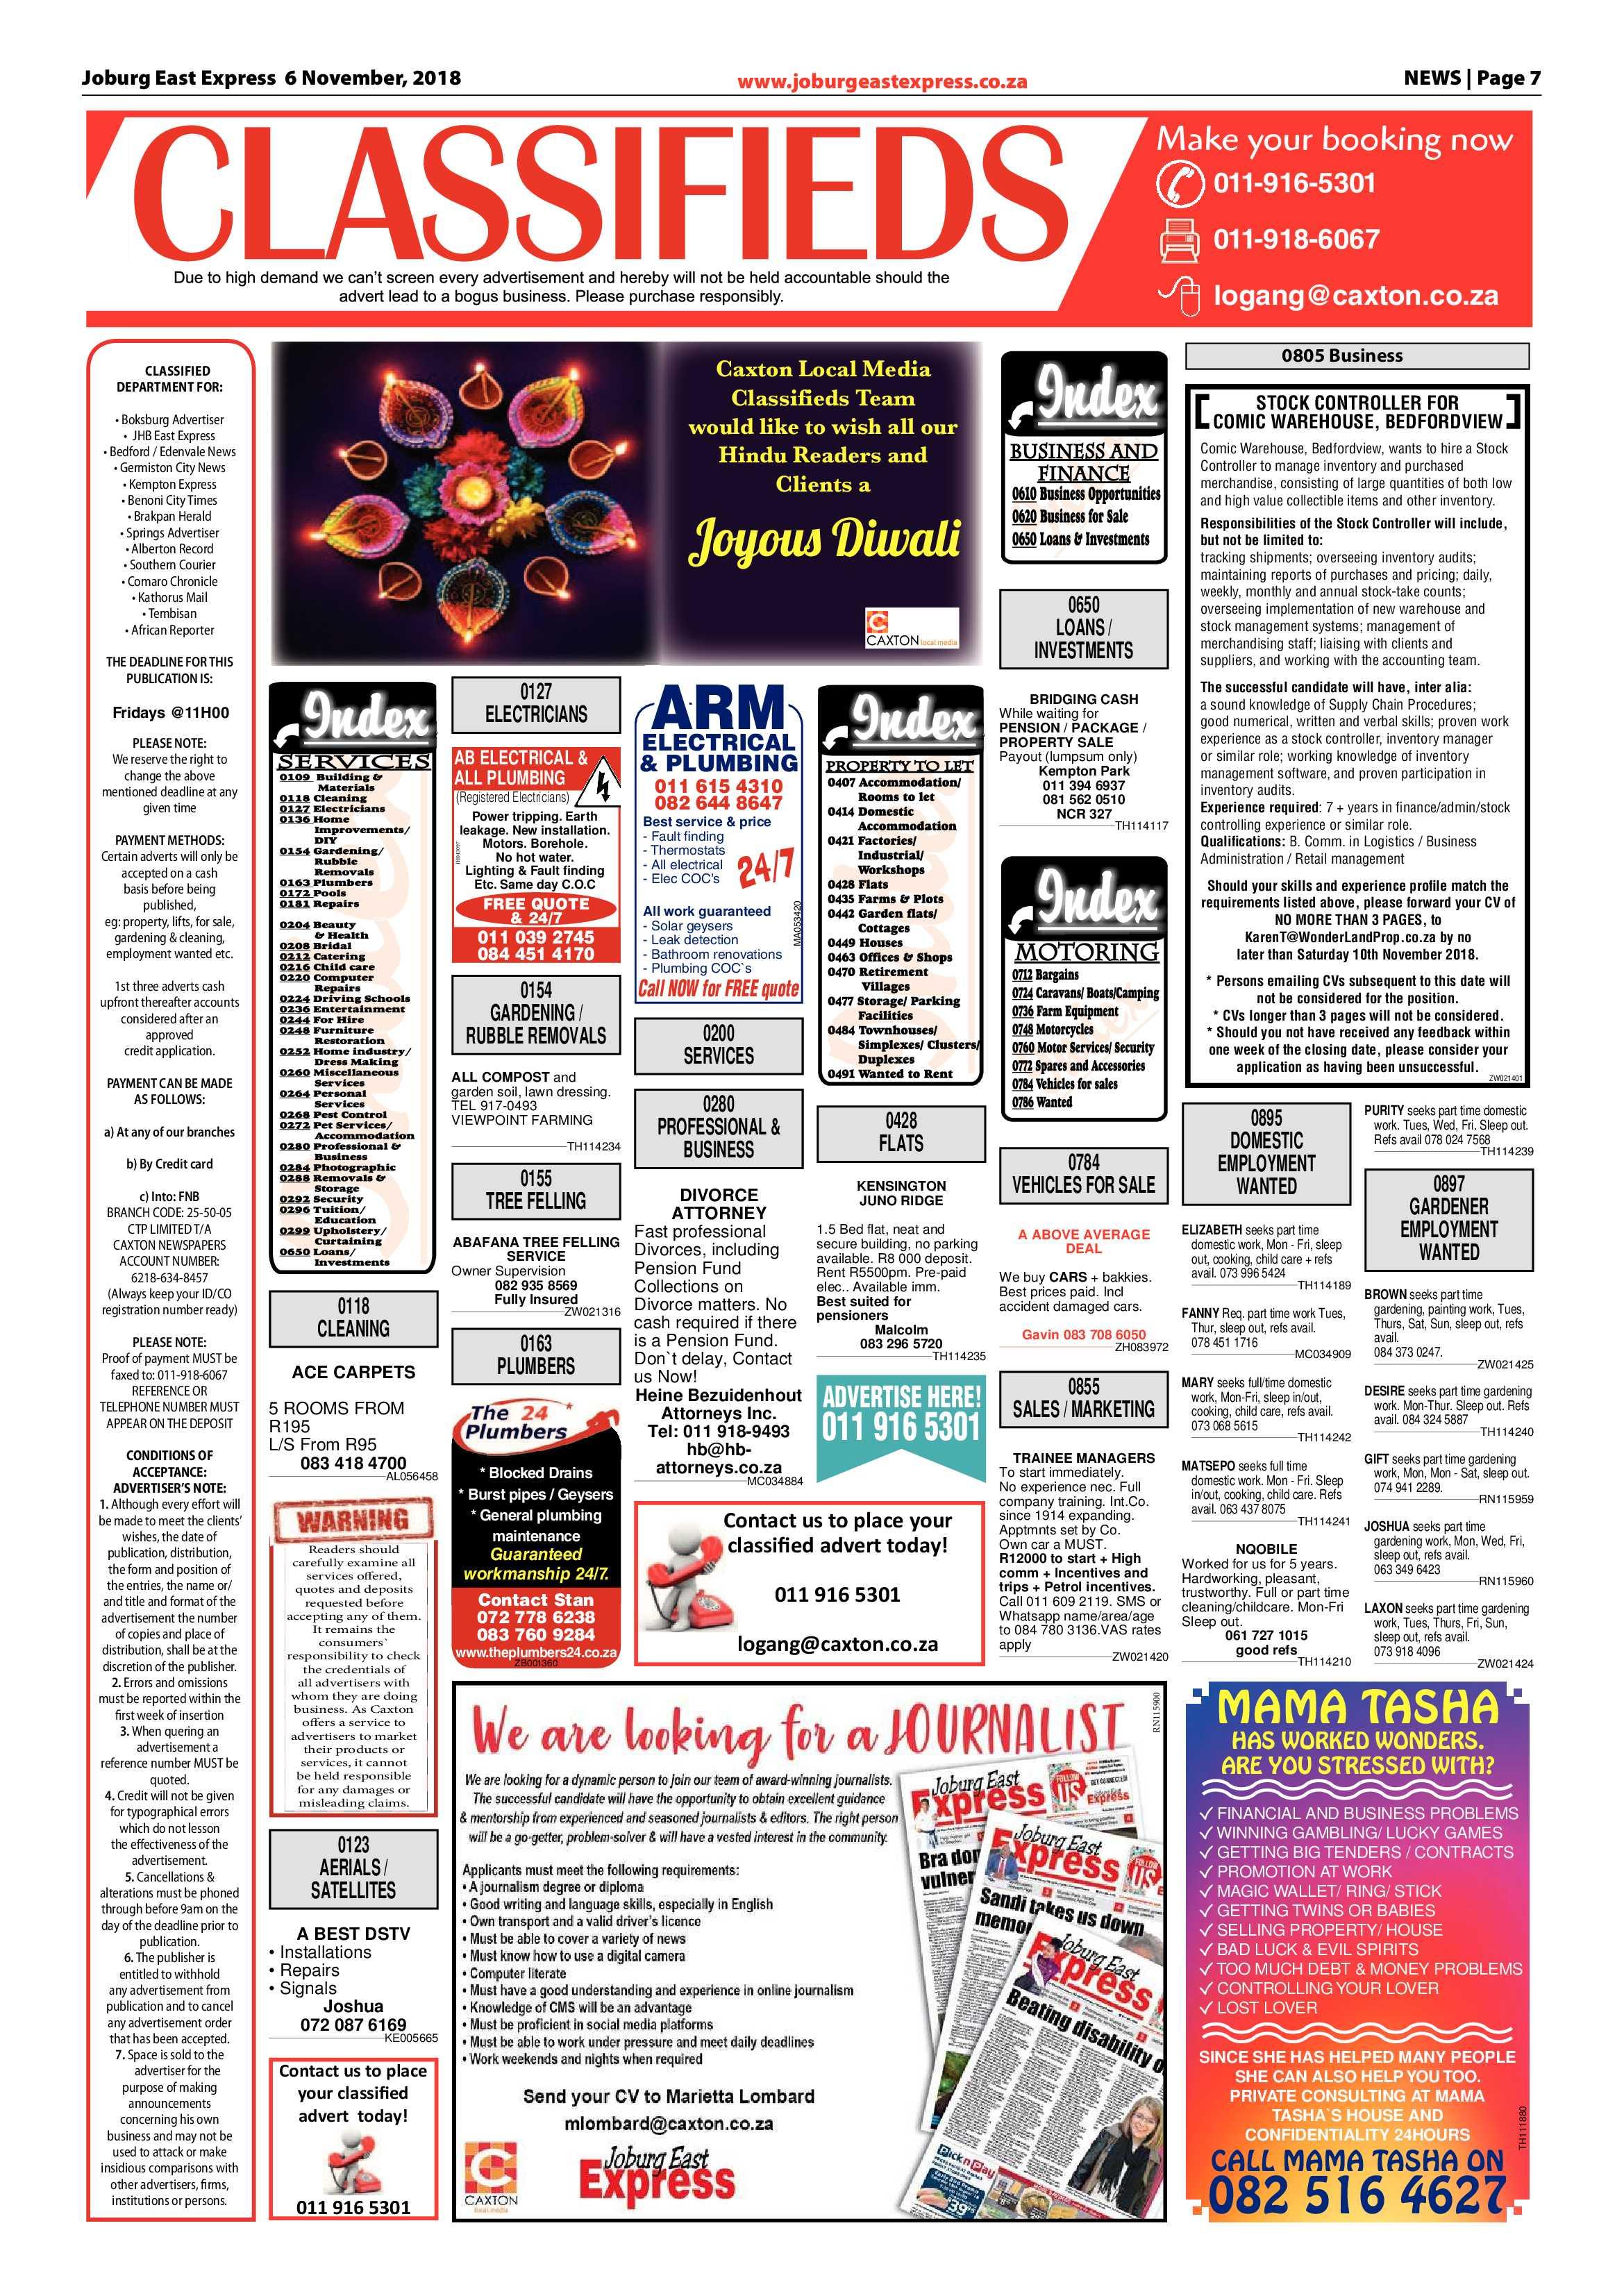 joburg-east-express-06-november-2018-epapers-page-7